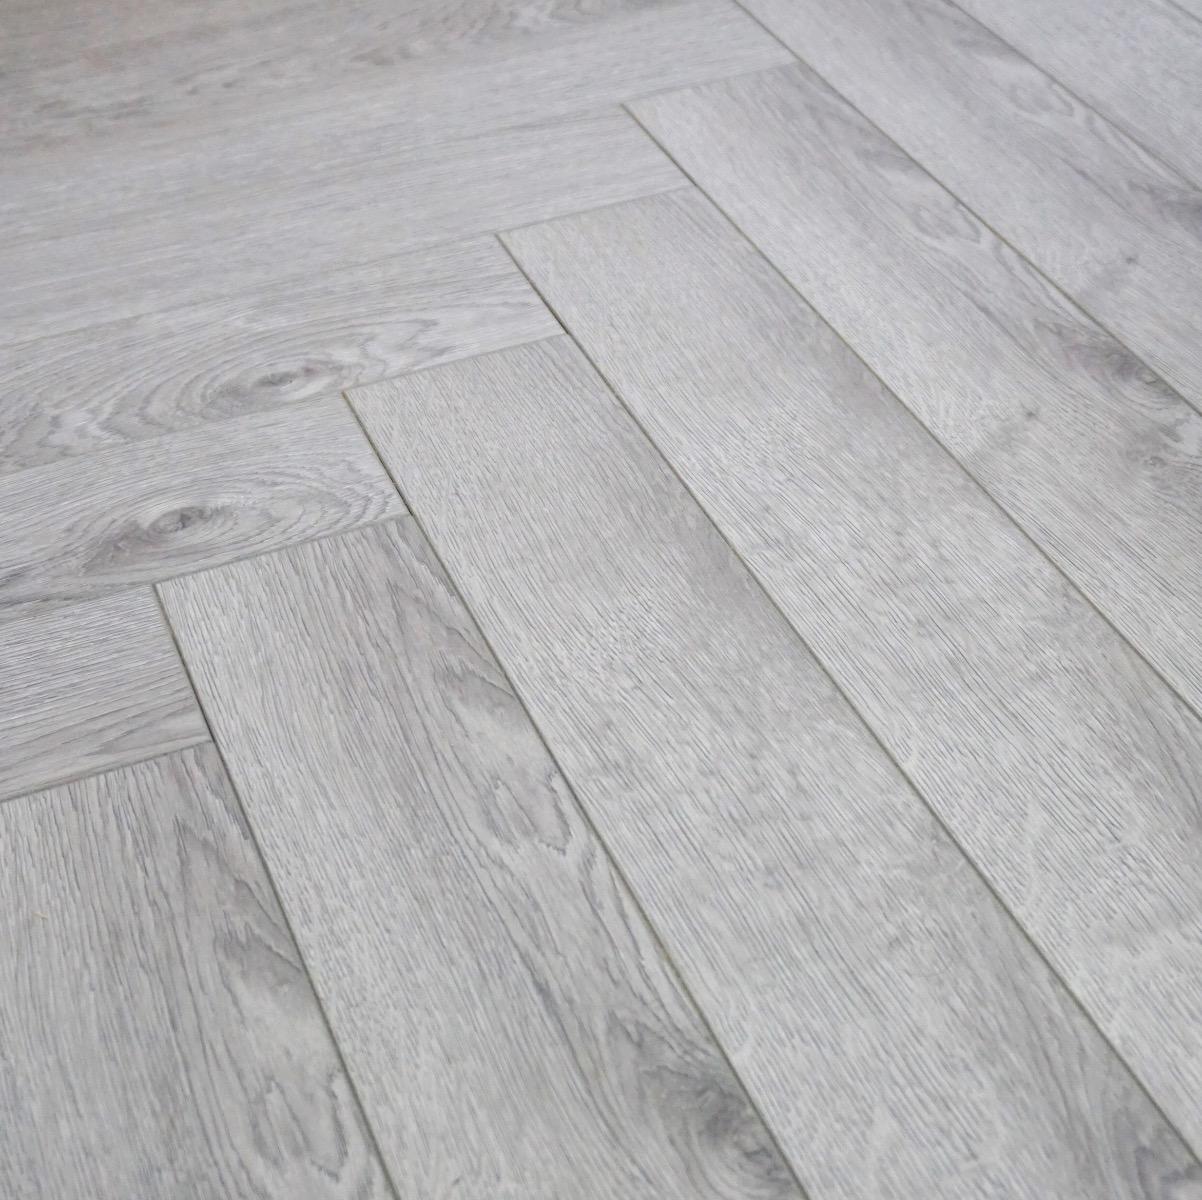 Grey Laminate Flooring 12mm Vinatge, Light Grey Oak Effect Laminate Flooring